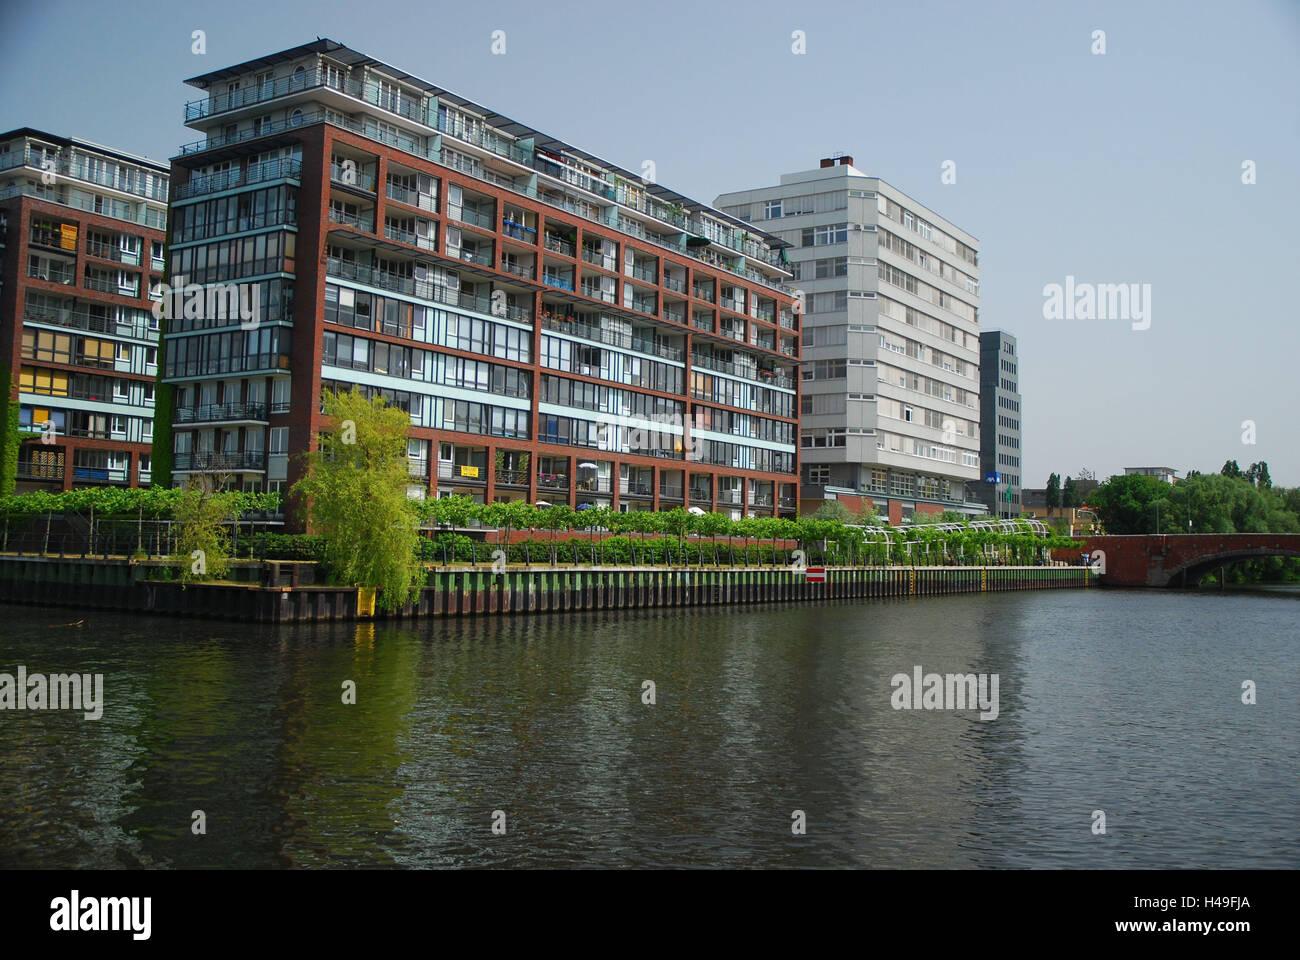 deutschland berlin spree bogen hausfassaden kapital berlin charlottenburg h user. Black Bedroom Furniture Sets. Home Design Ideas